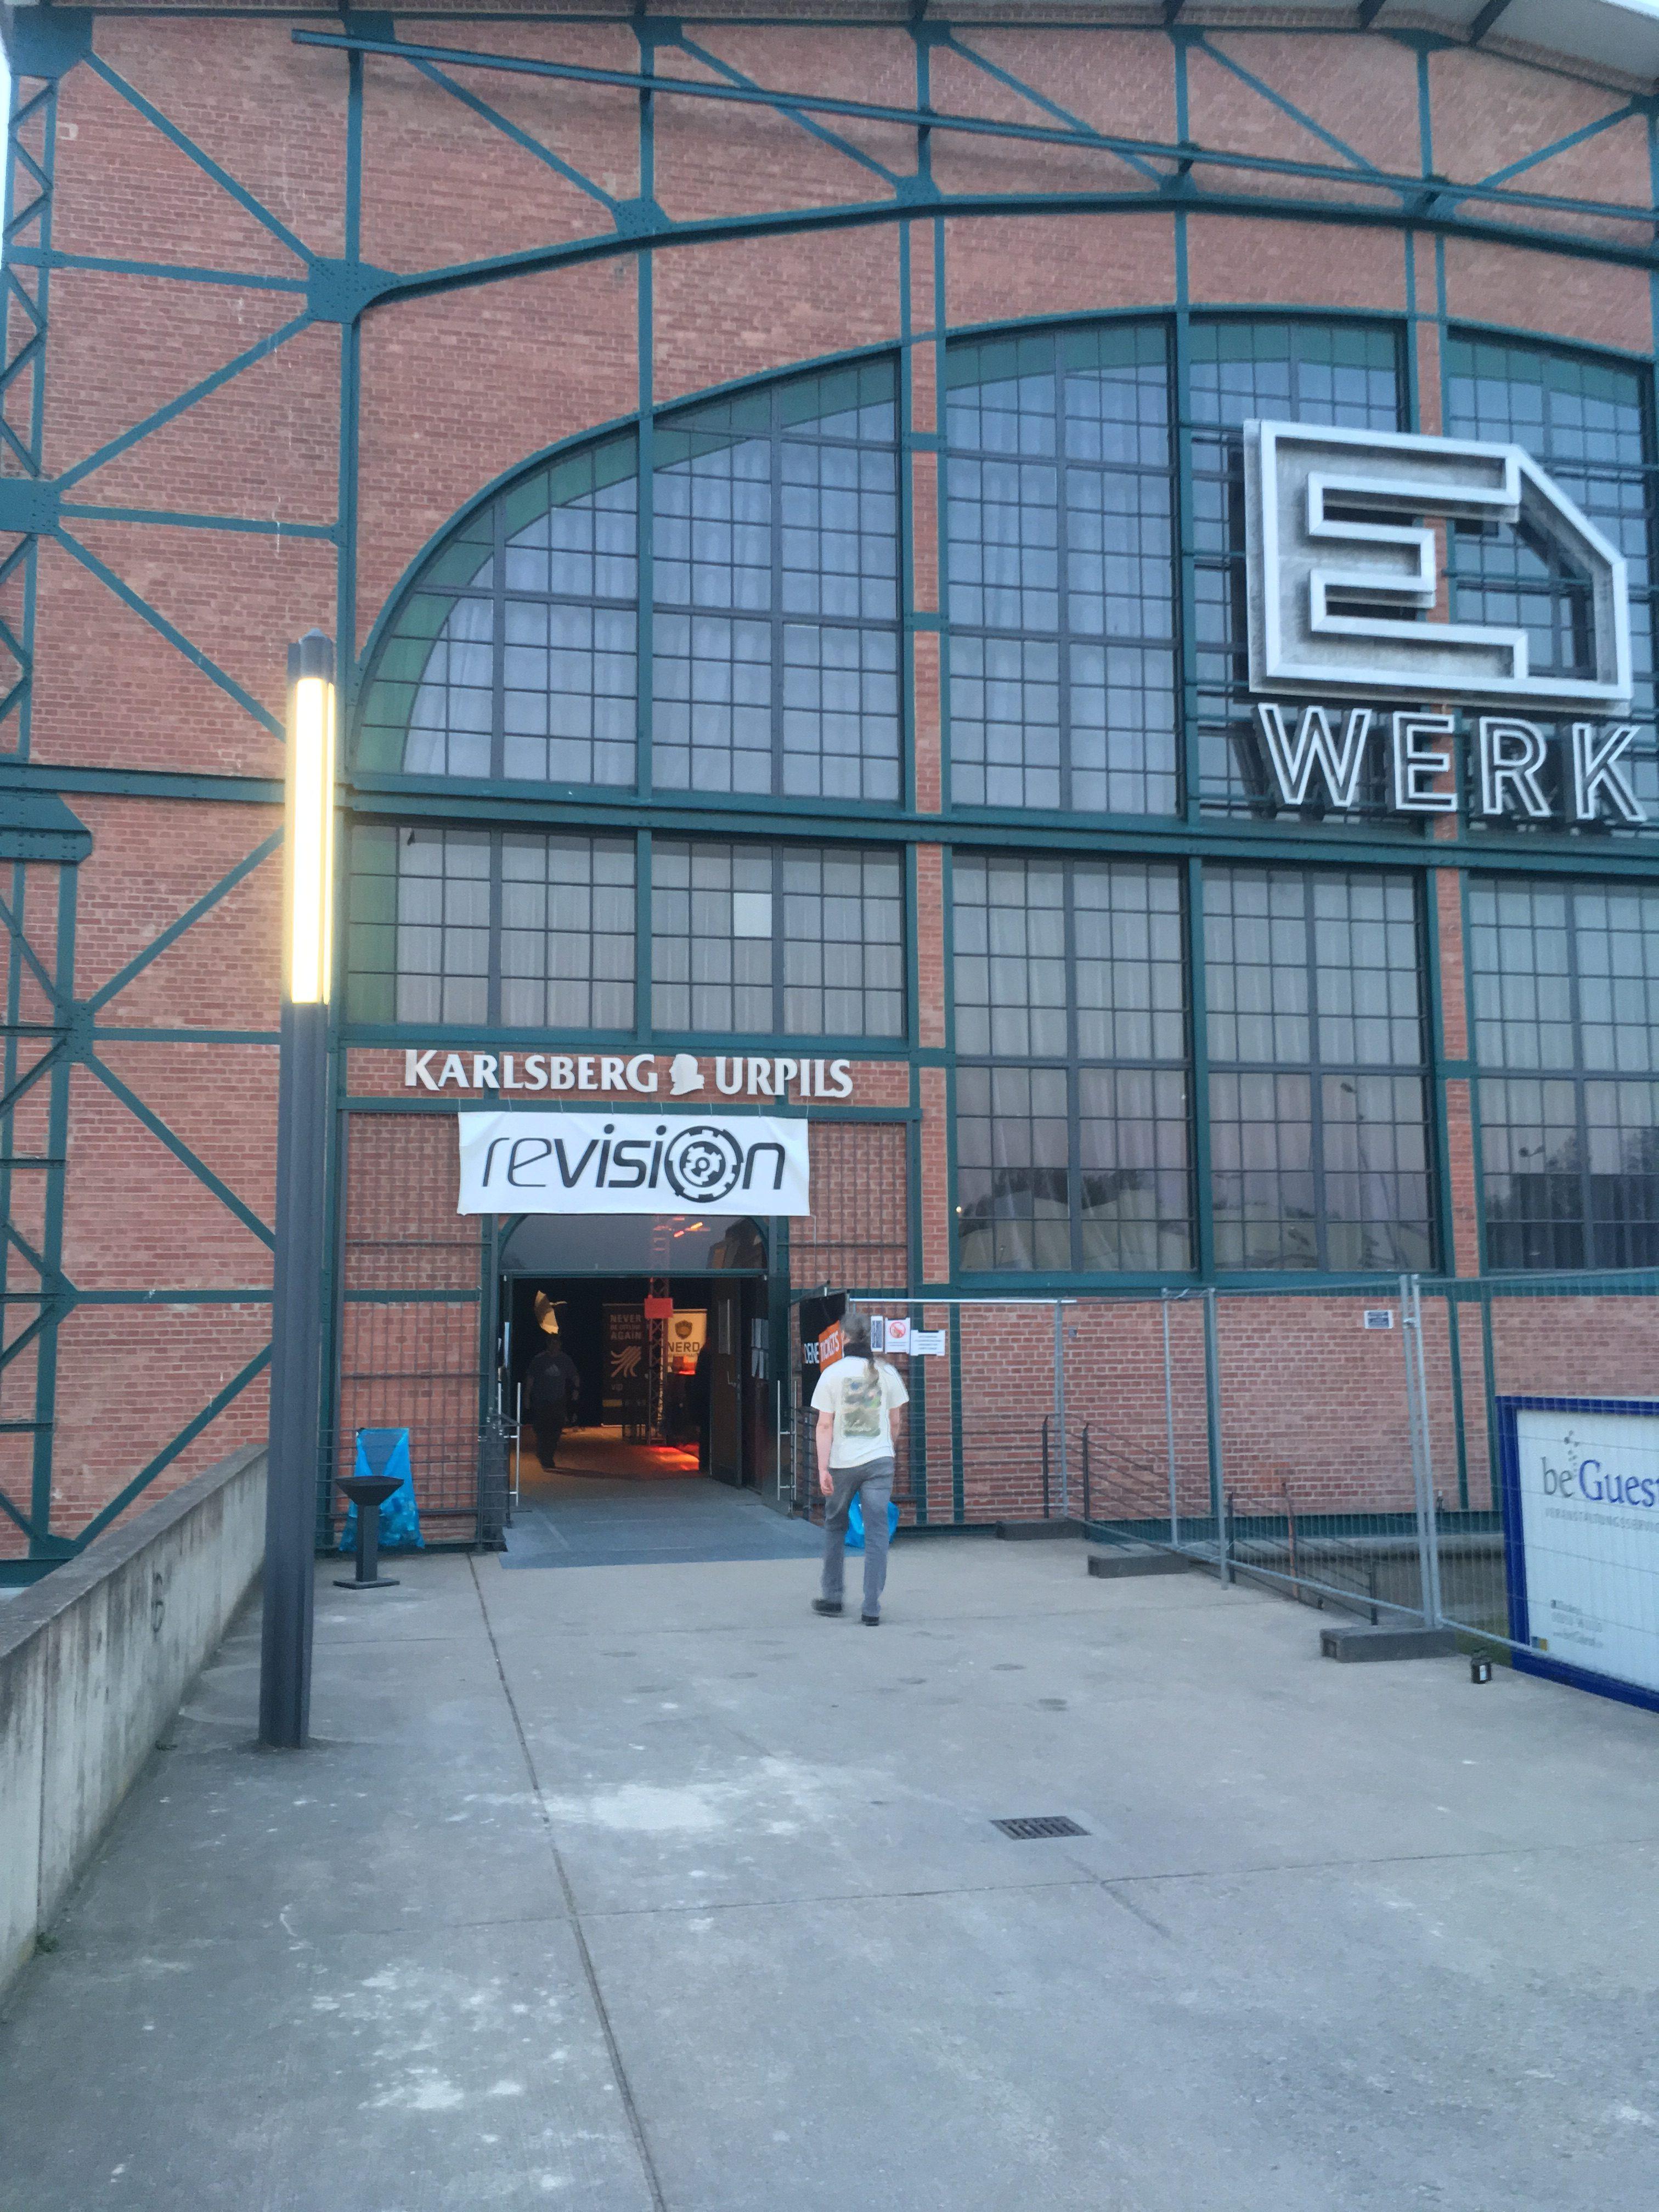 Revision 2019 entrance